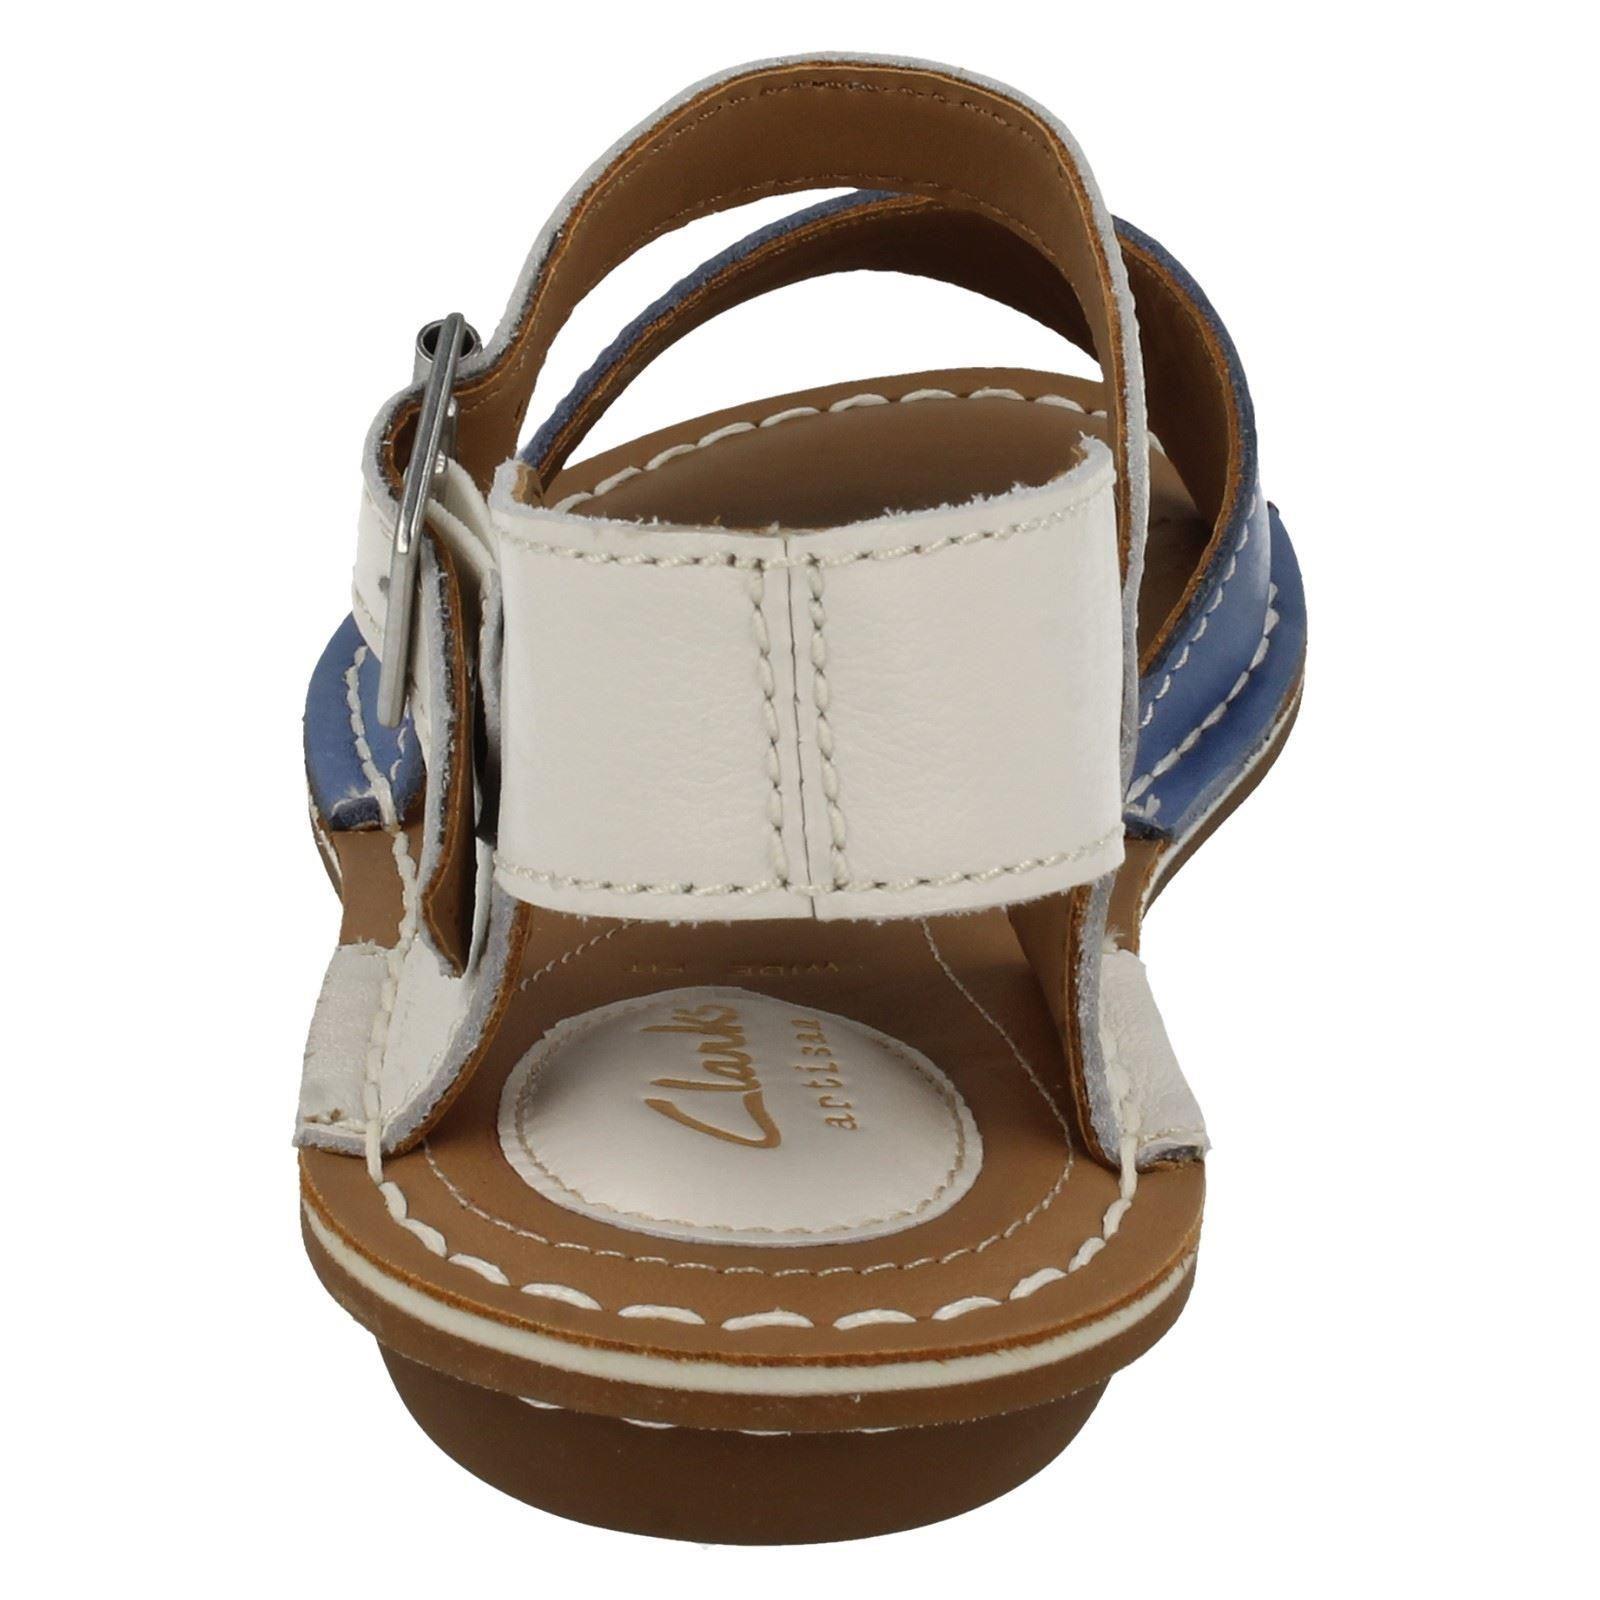 Ladies Clarks Summer Sandals /'Tustin Sinitta/'